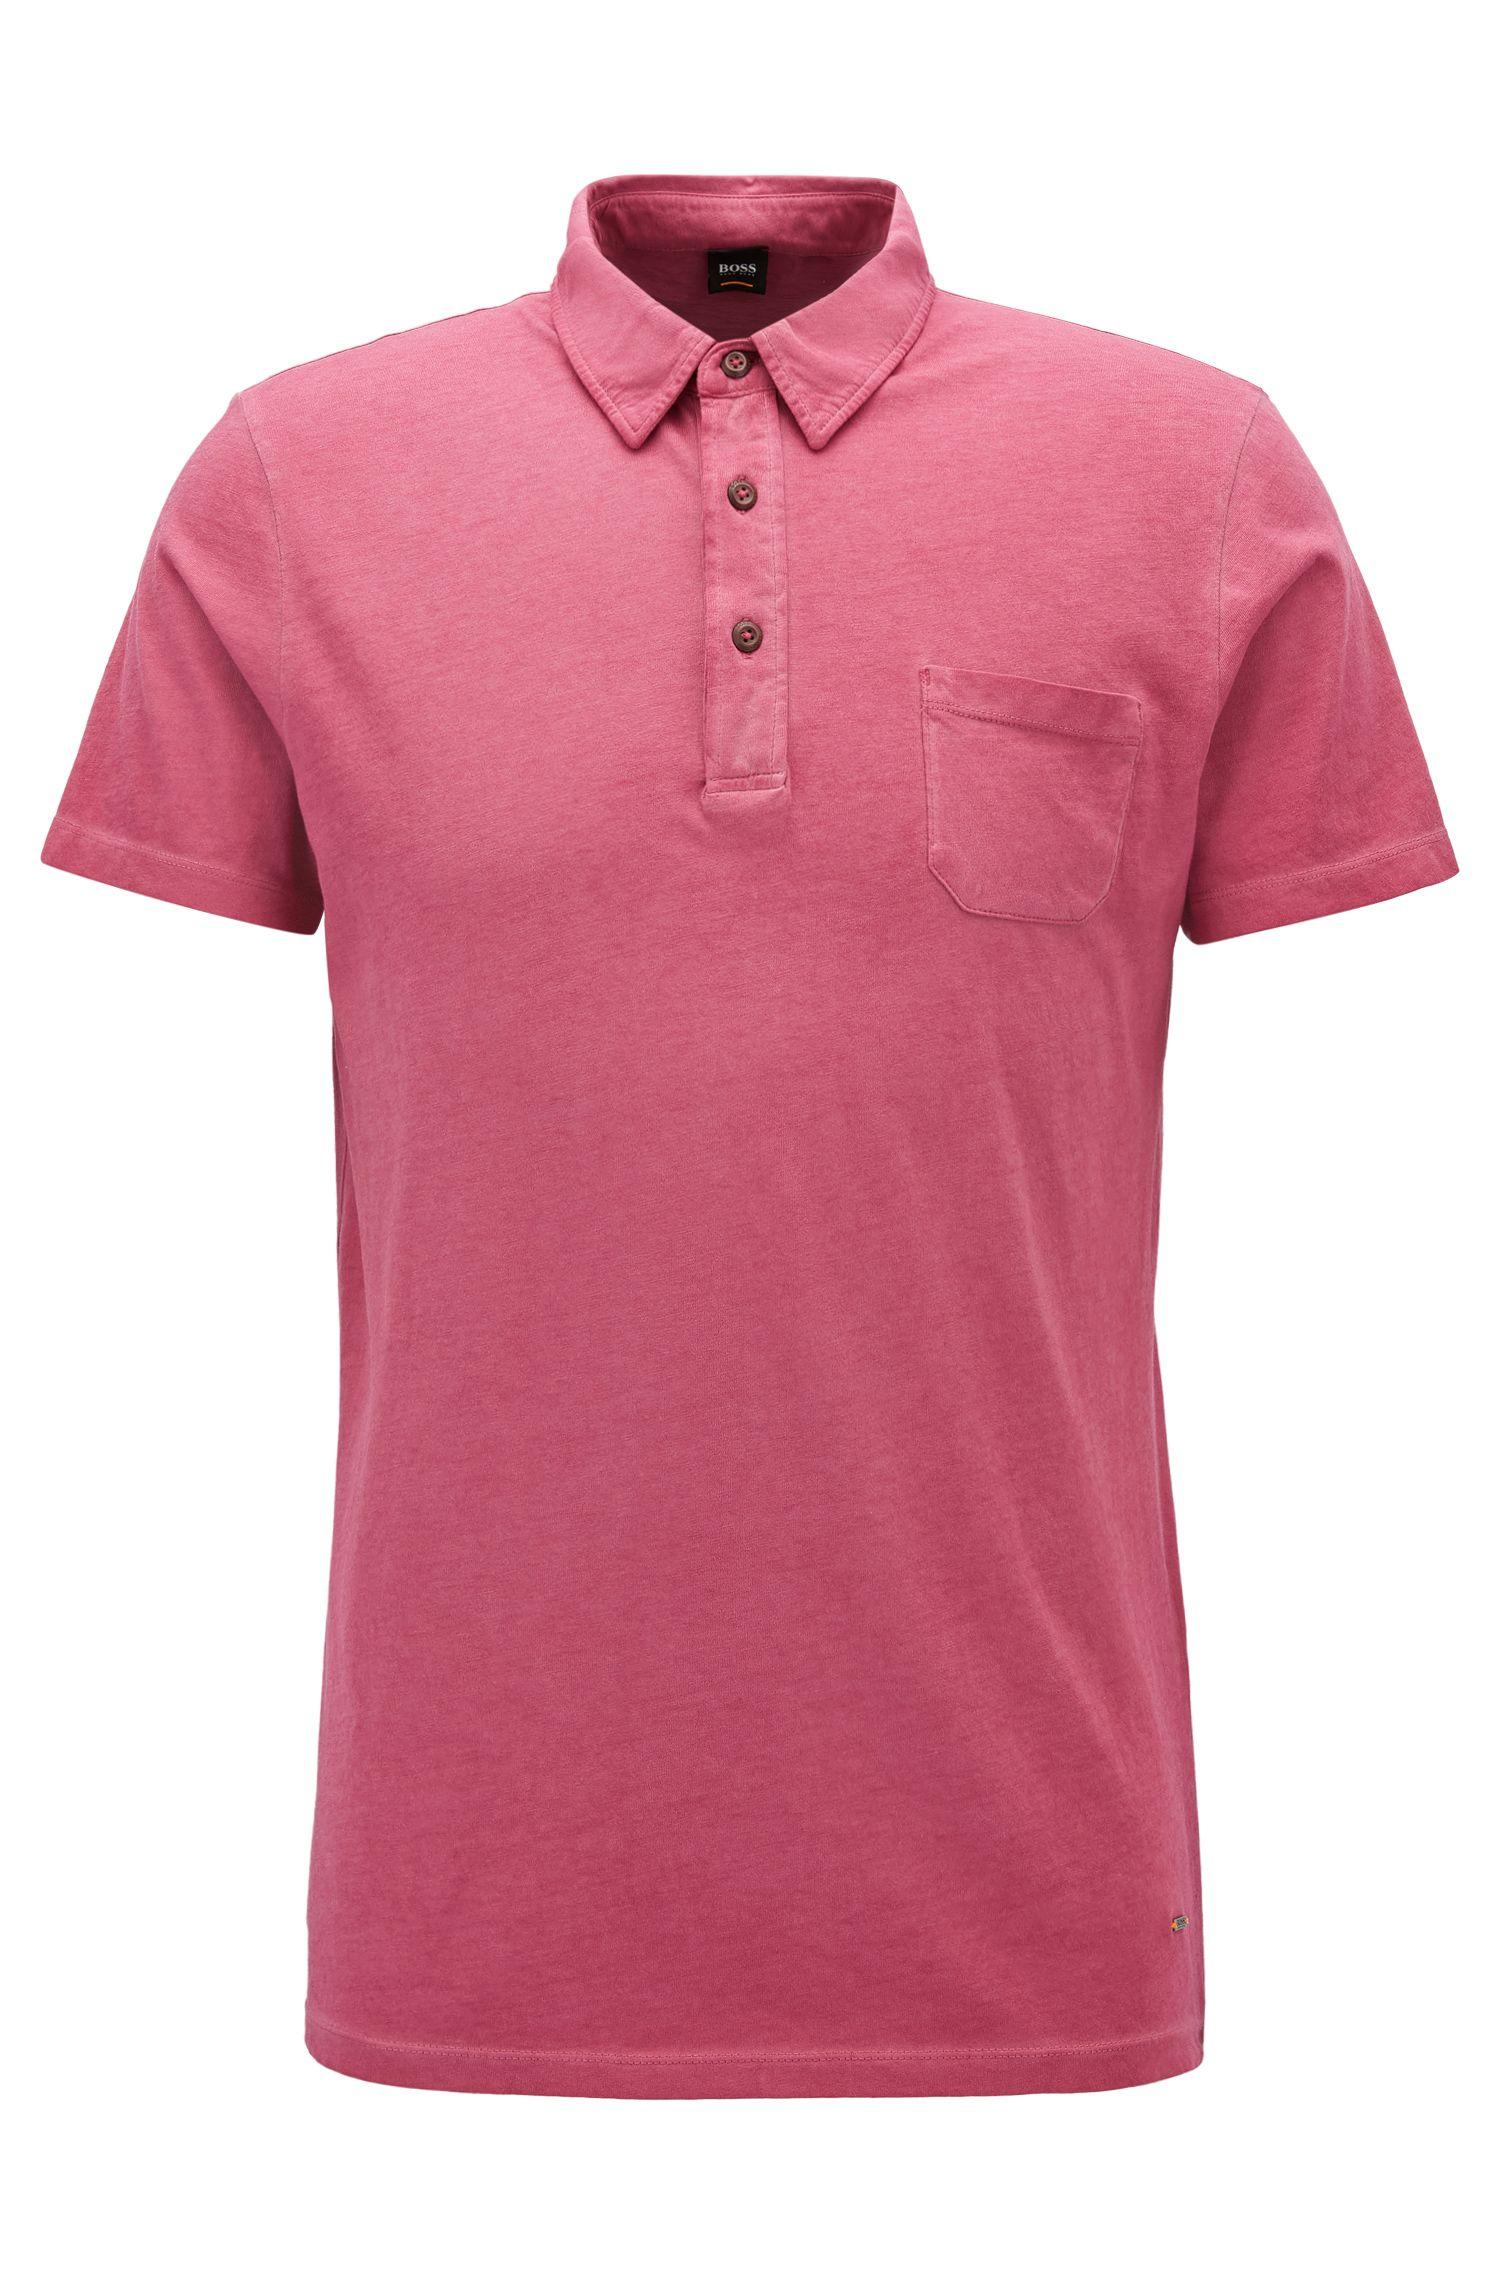 Garment-Dyed Cotton Polo Shirt, Regular Fit | Purpose, Dark Purple